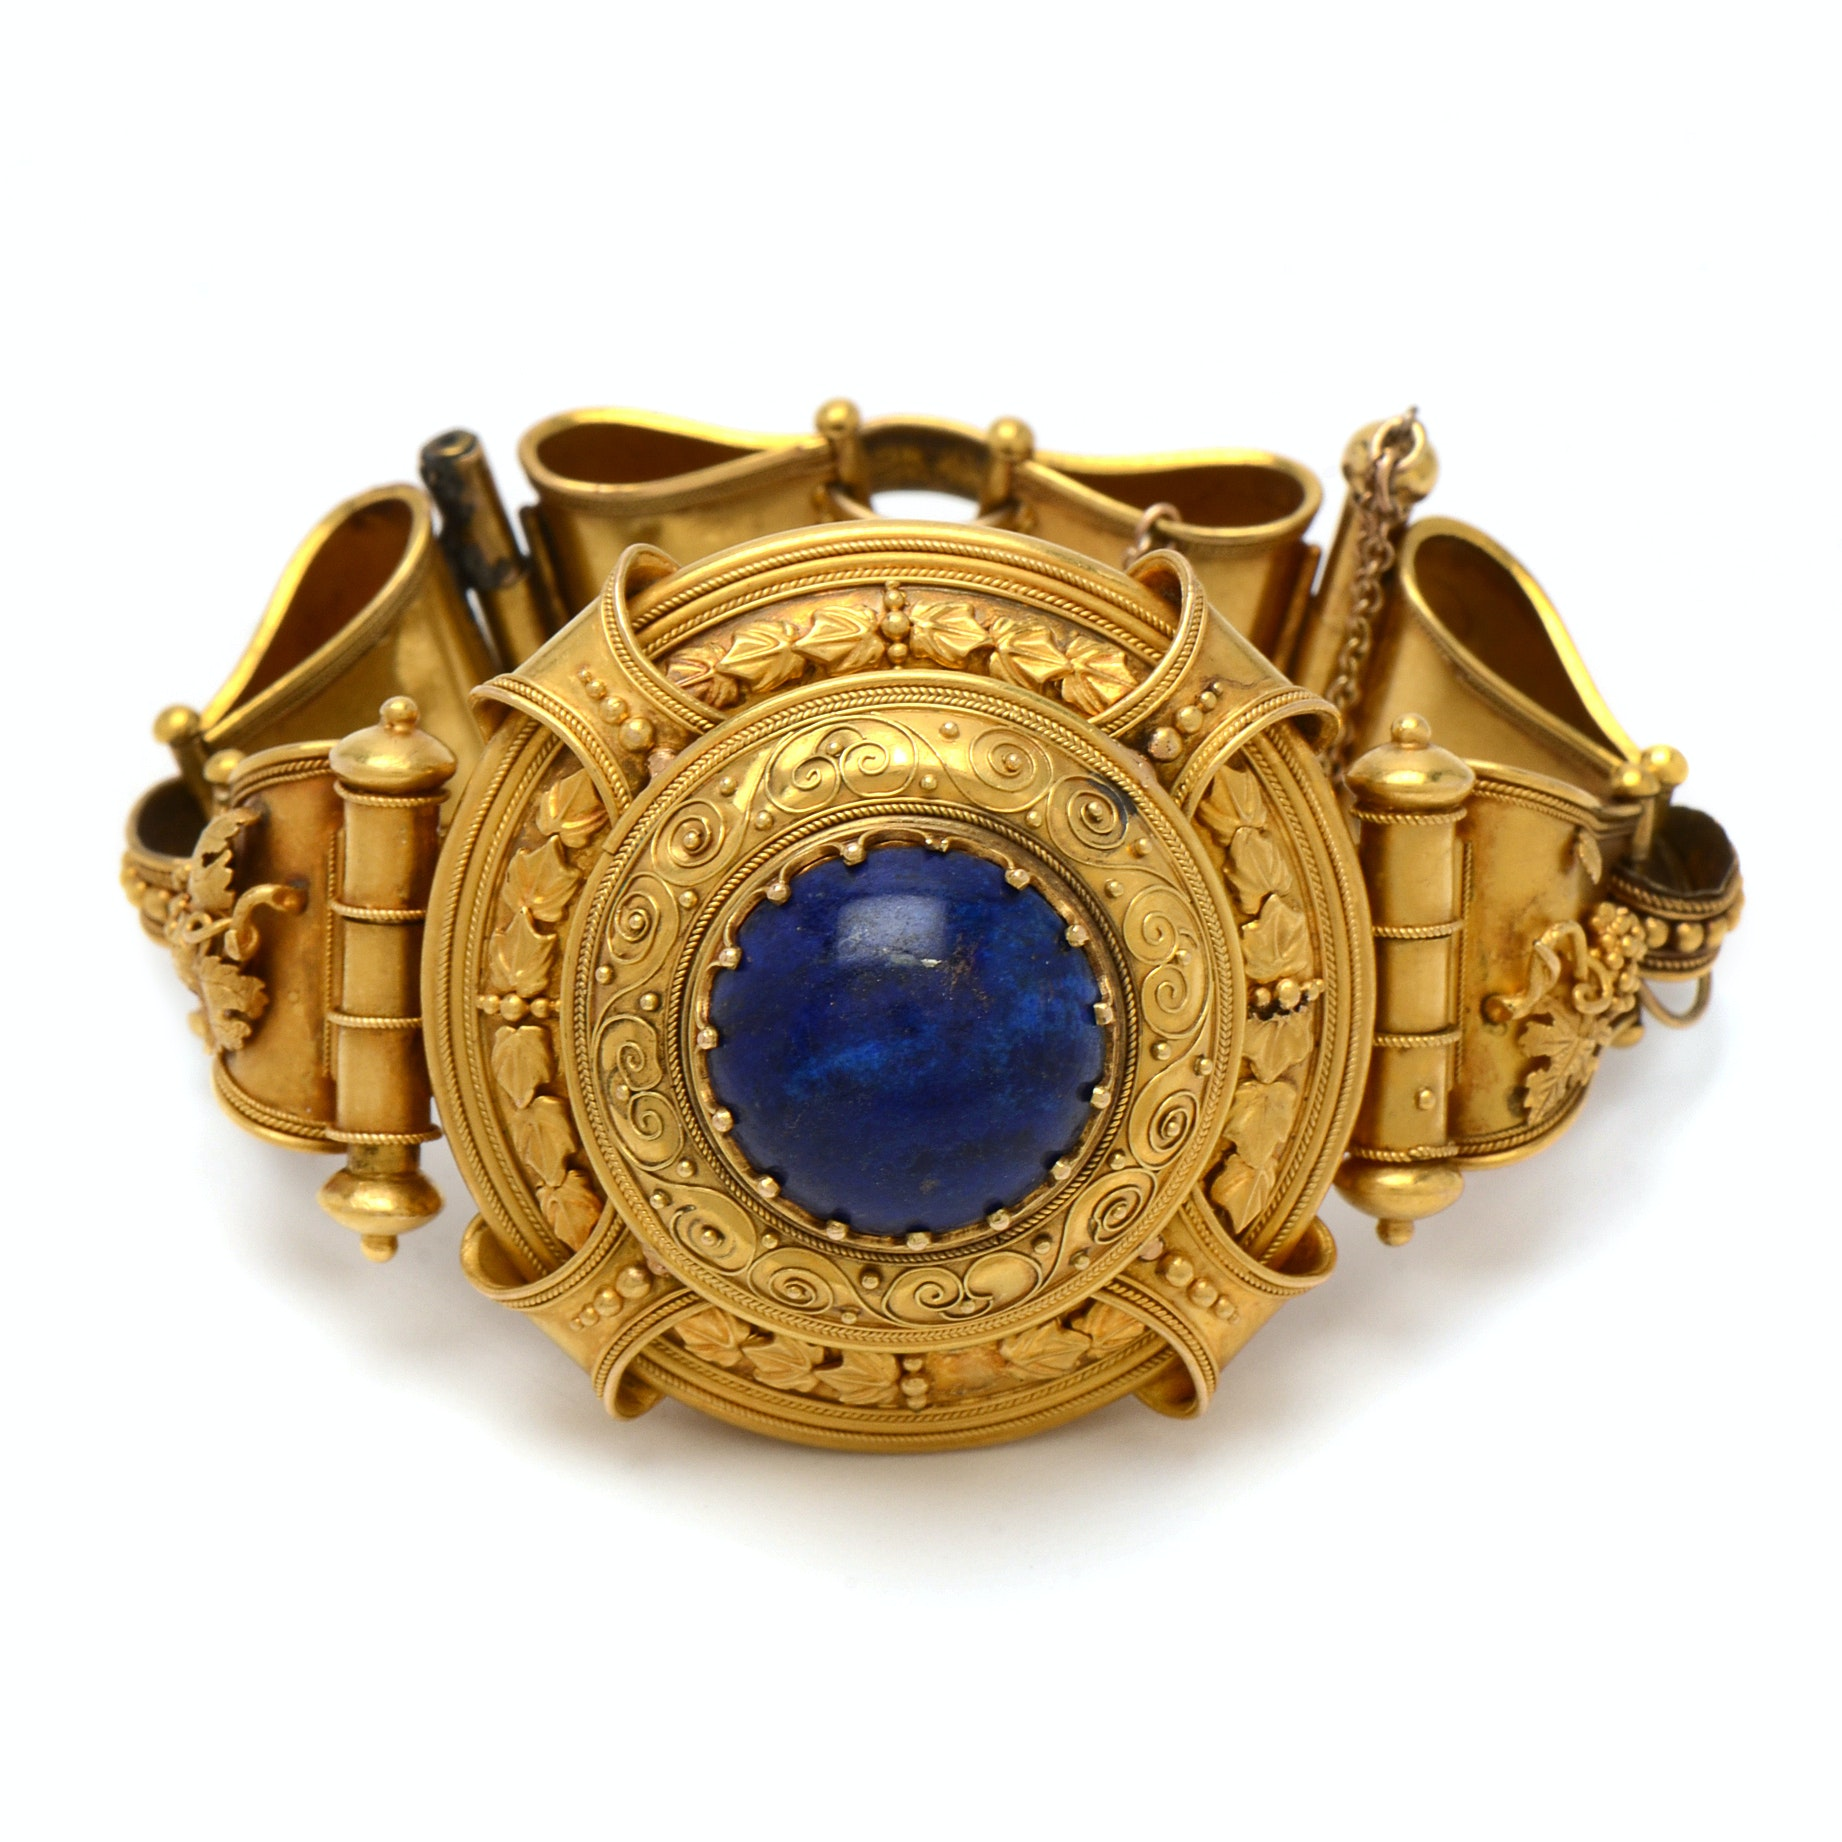 Victorian Etruscan Revival 14K Yellow Gold Lapis Lazuli Wide Bracelet